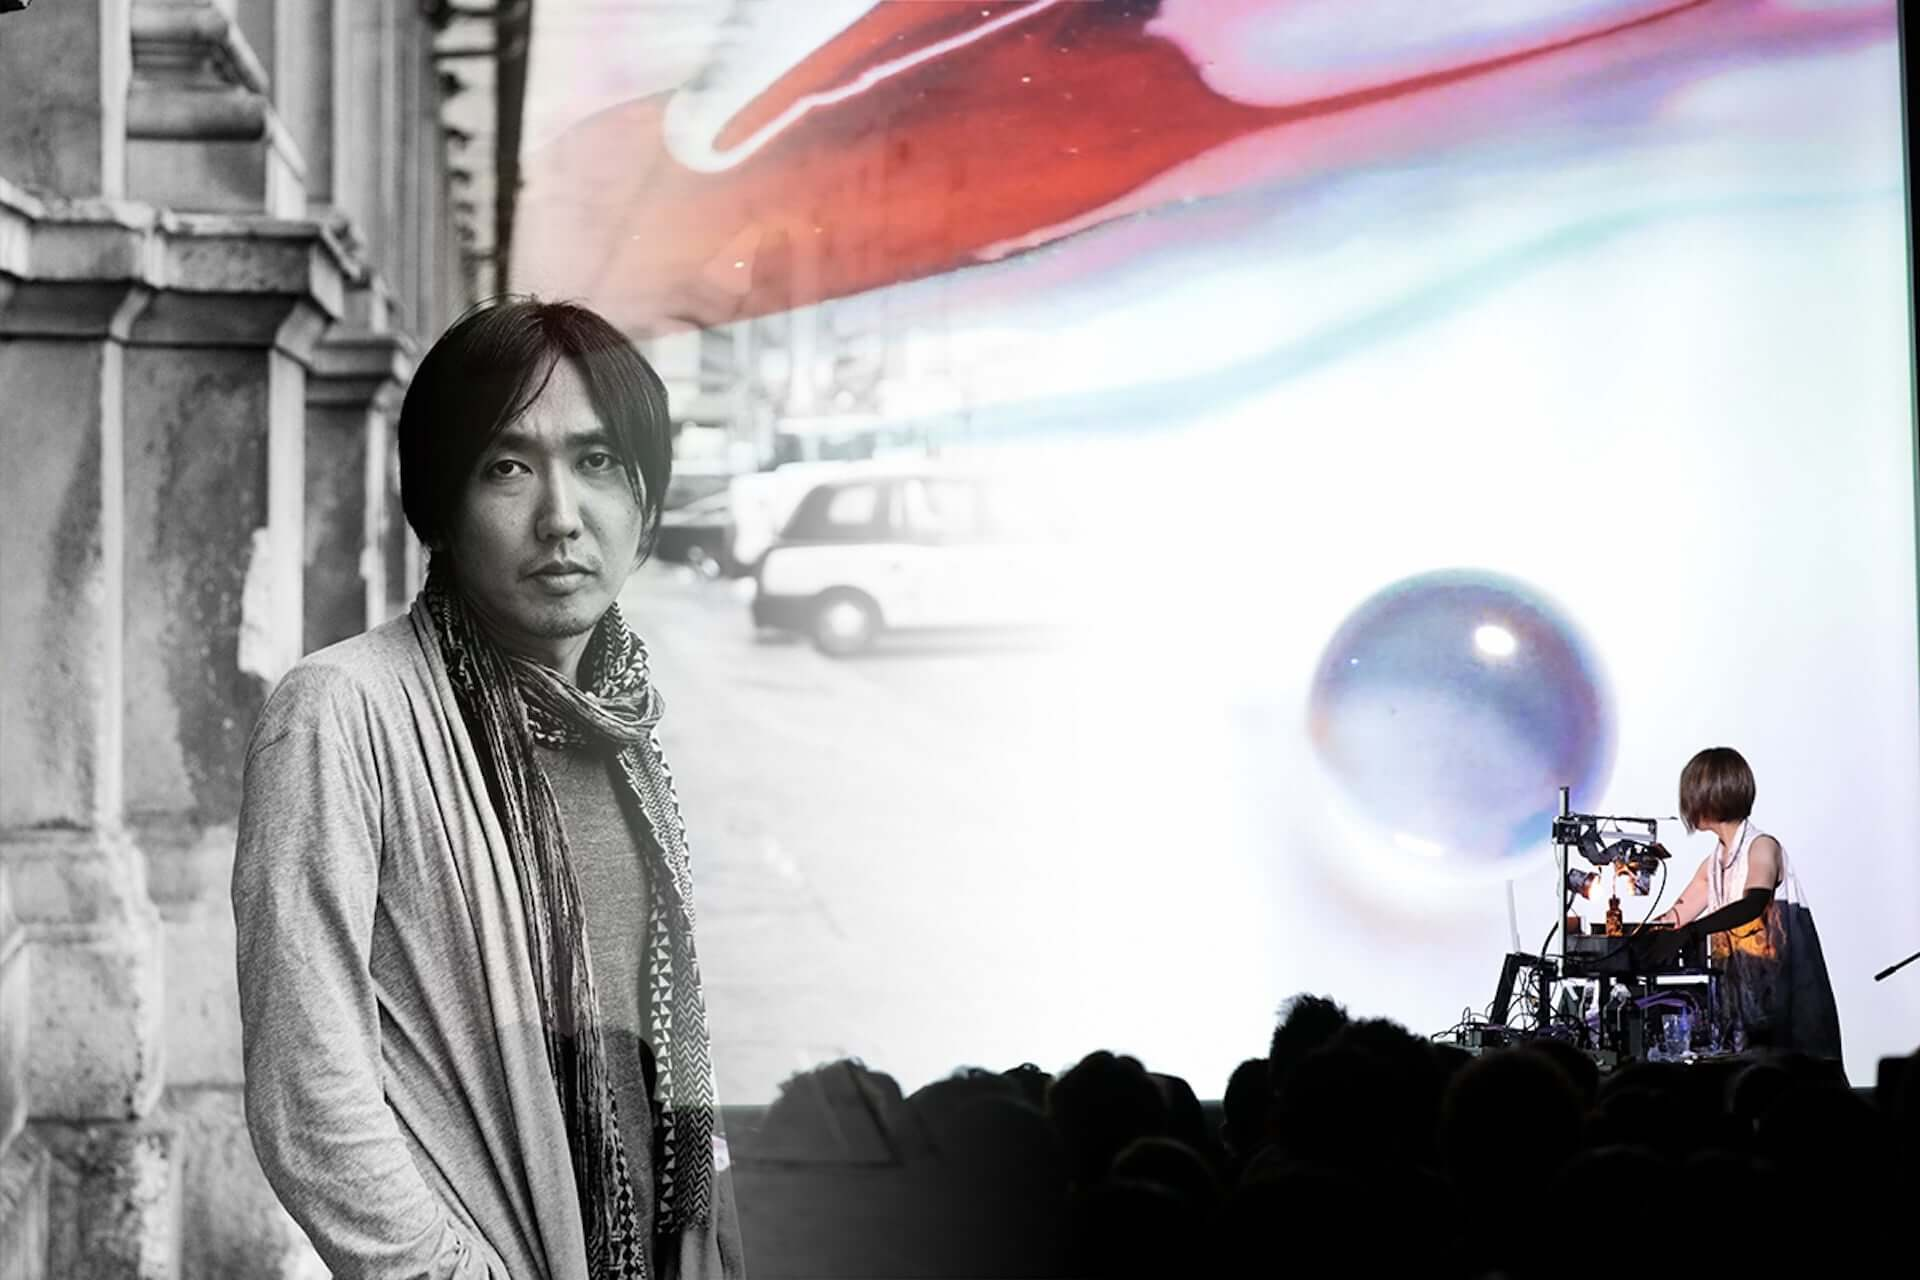 <MUTEK.JP 2020>がリアル&オンラインイベントとして開催決定!真鍋大度、中山晃子、Kyoka、Shohei Fujimoto、Neutralらが出演 art201111_mutek_7-1920x1280